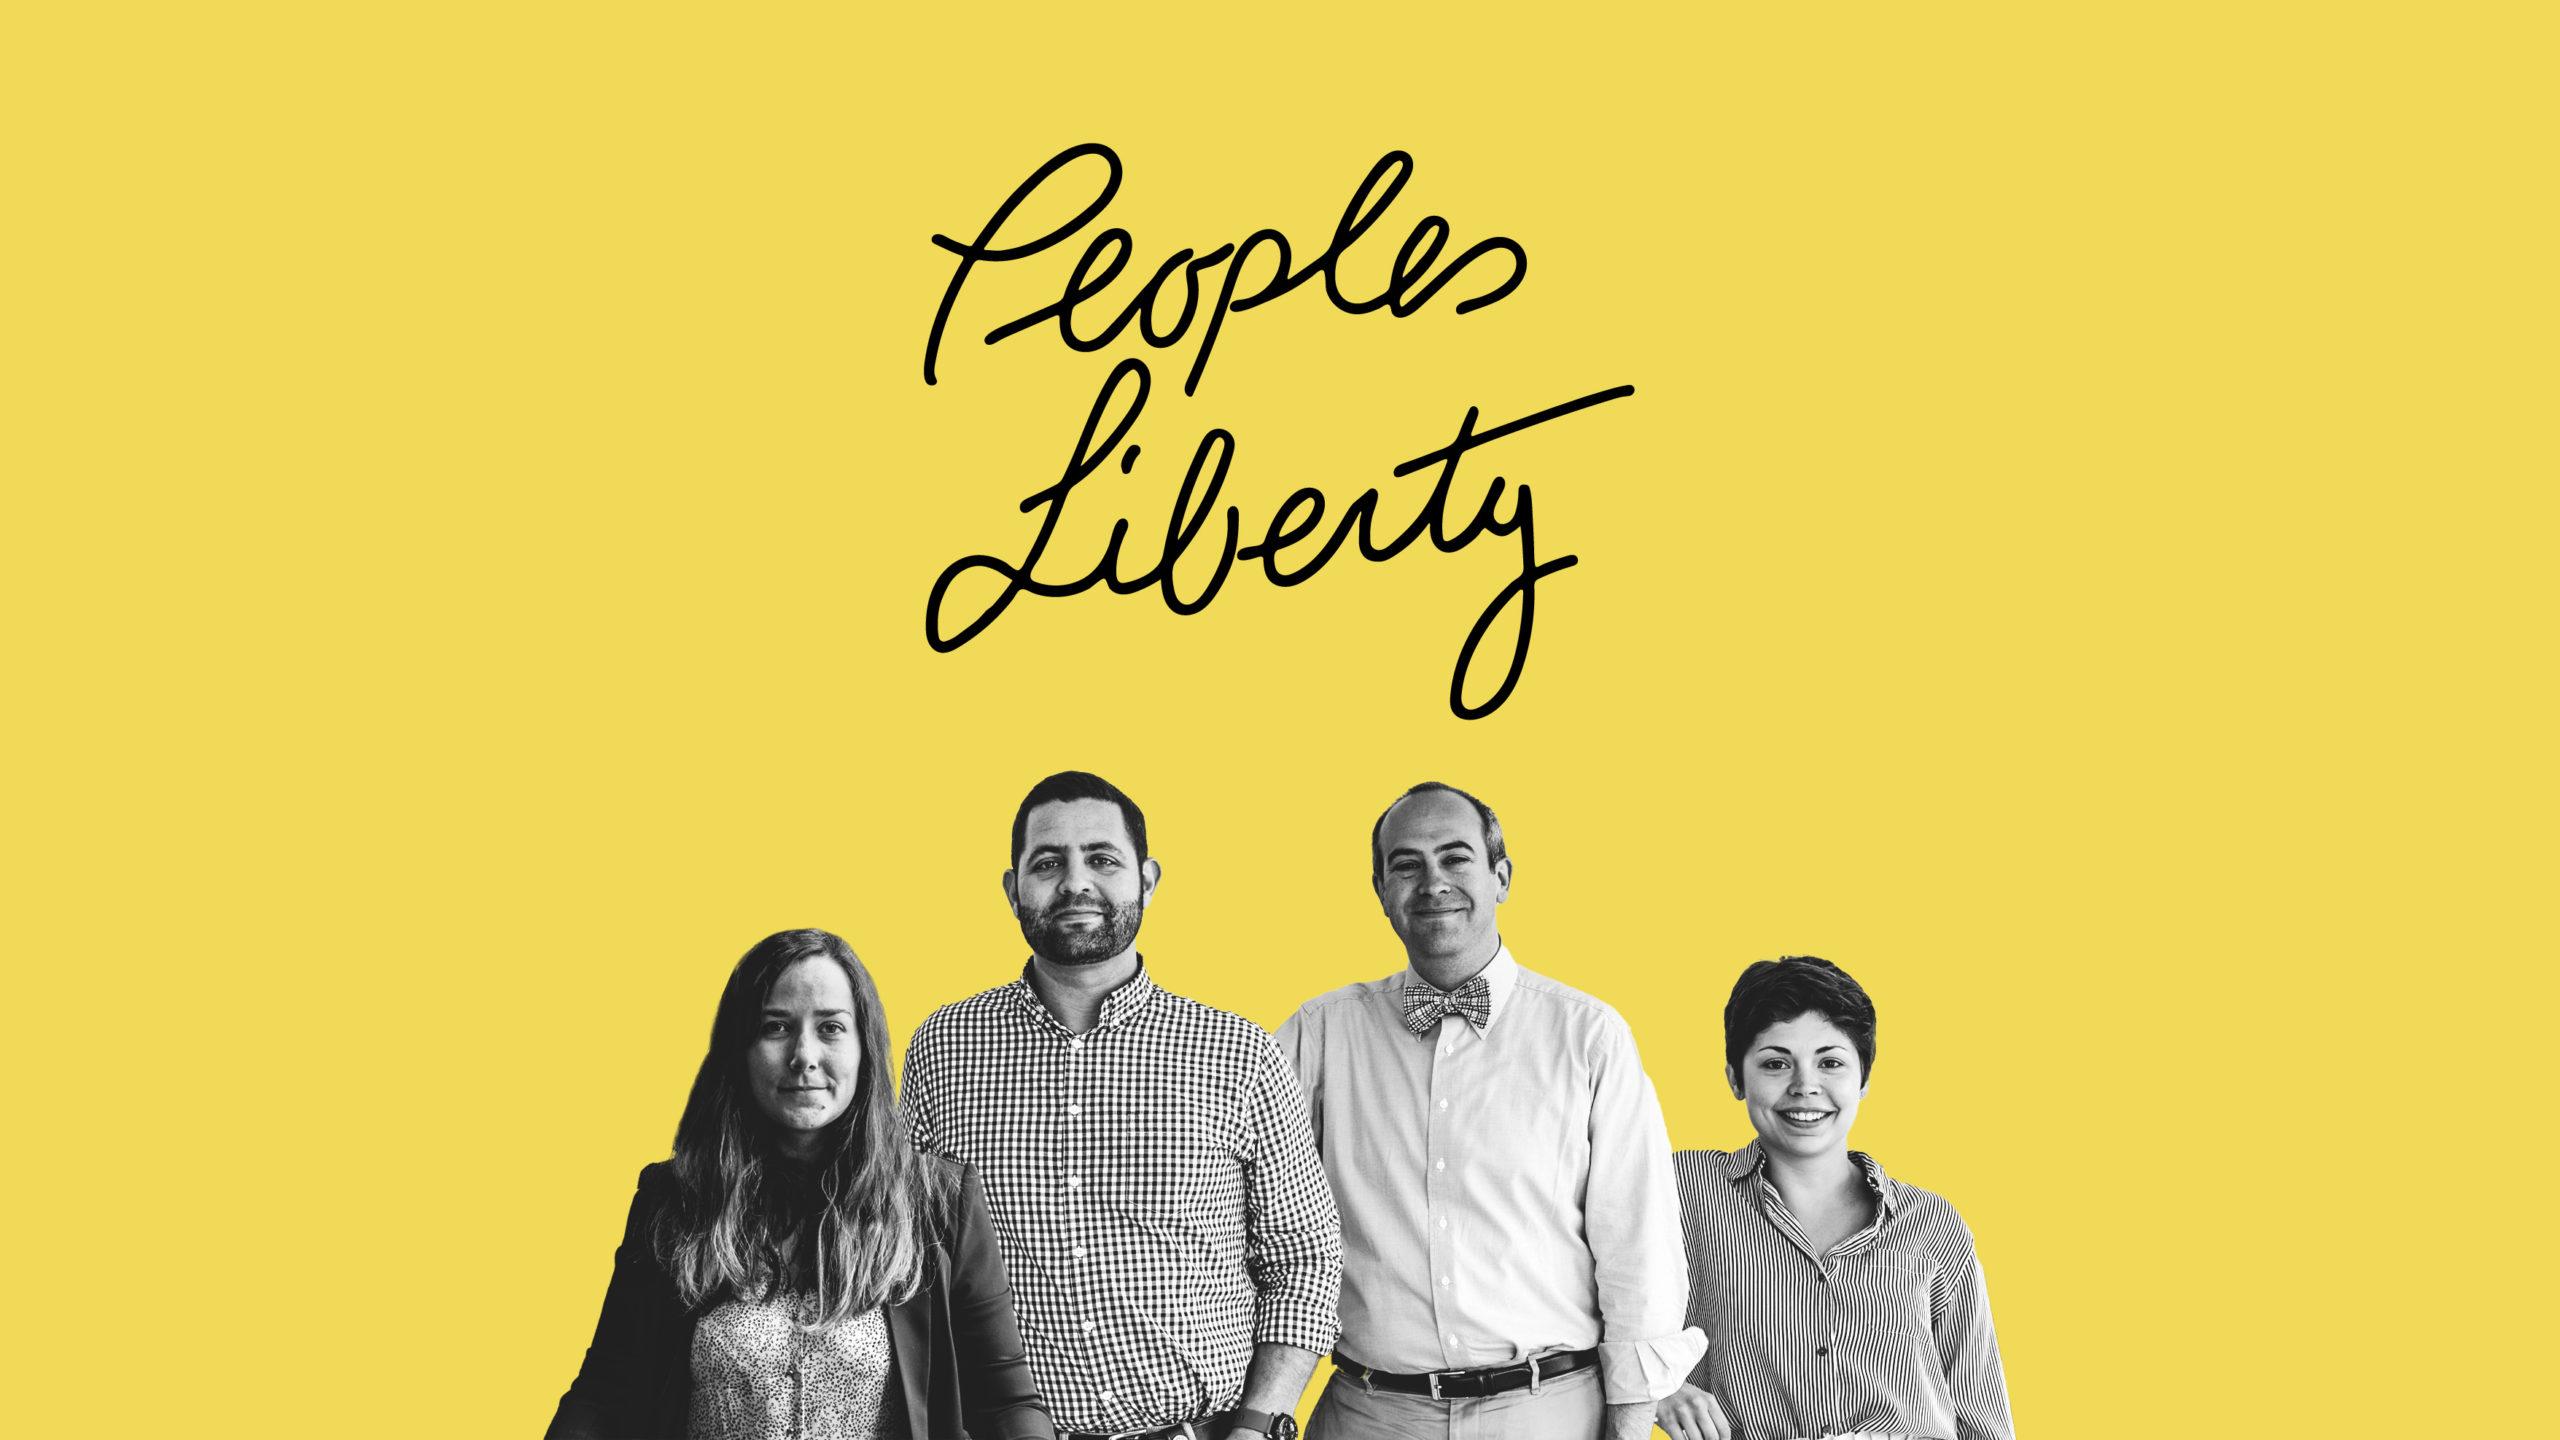 People's Liberty